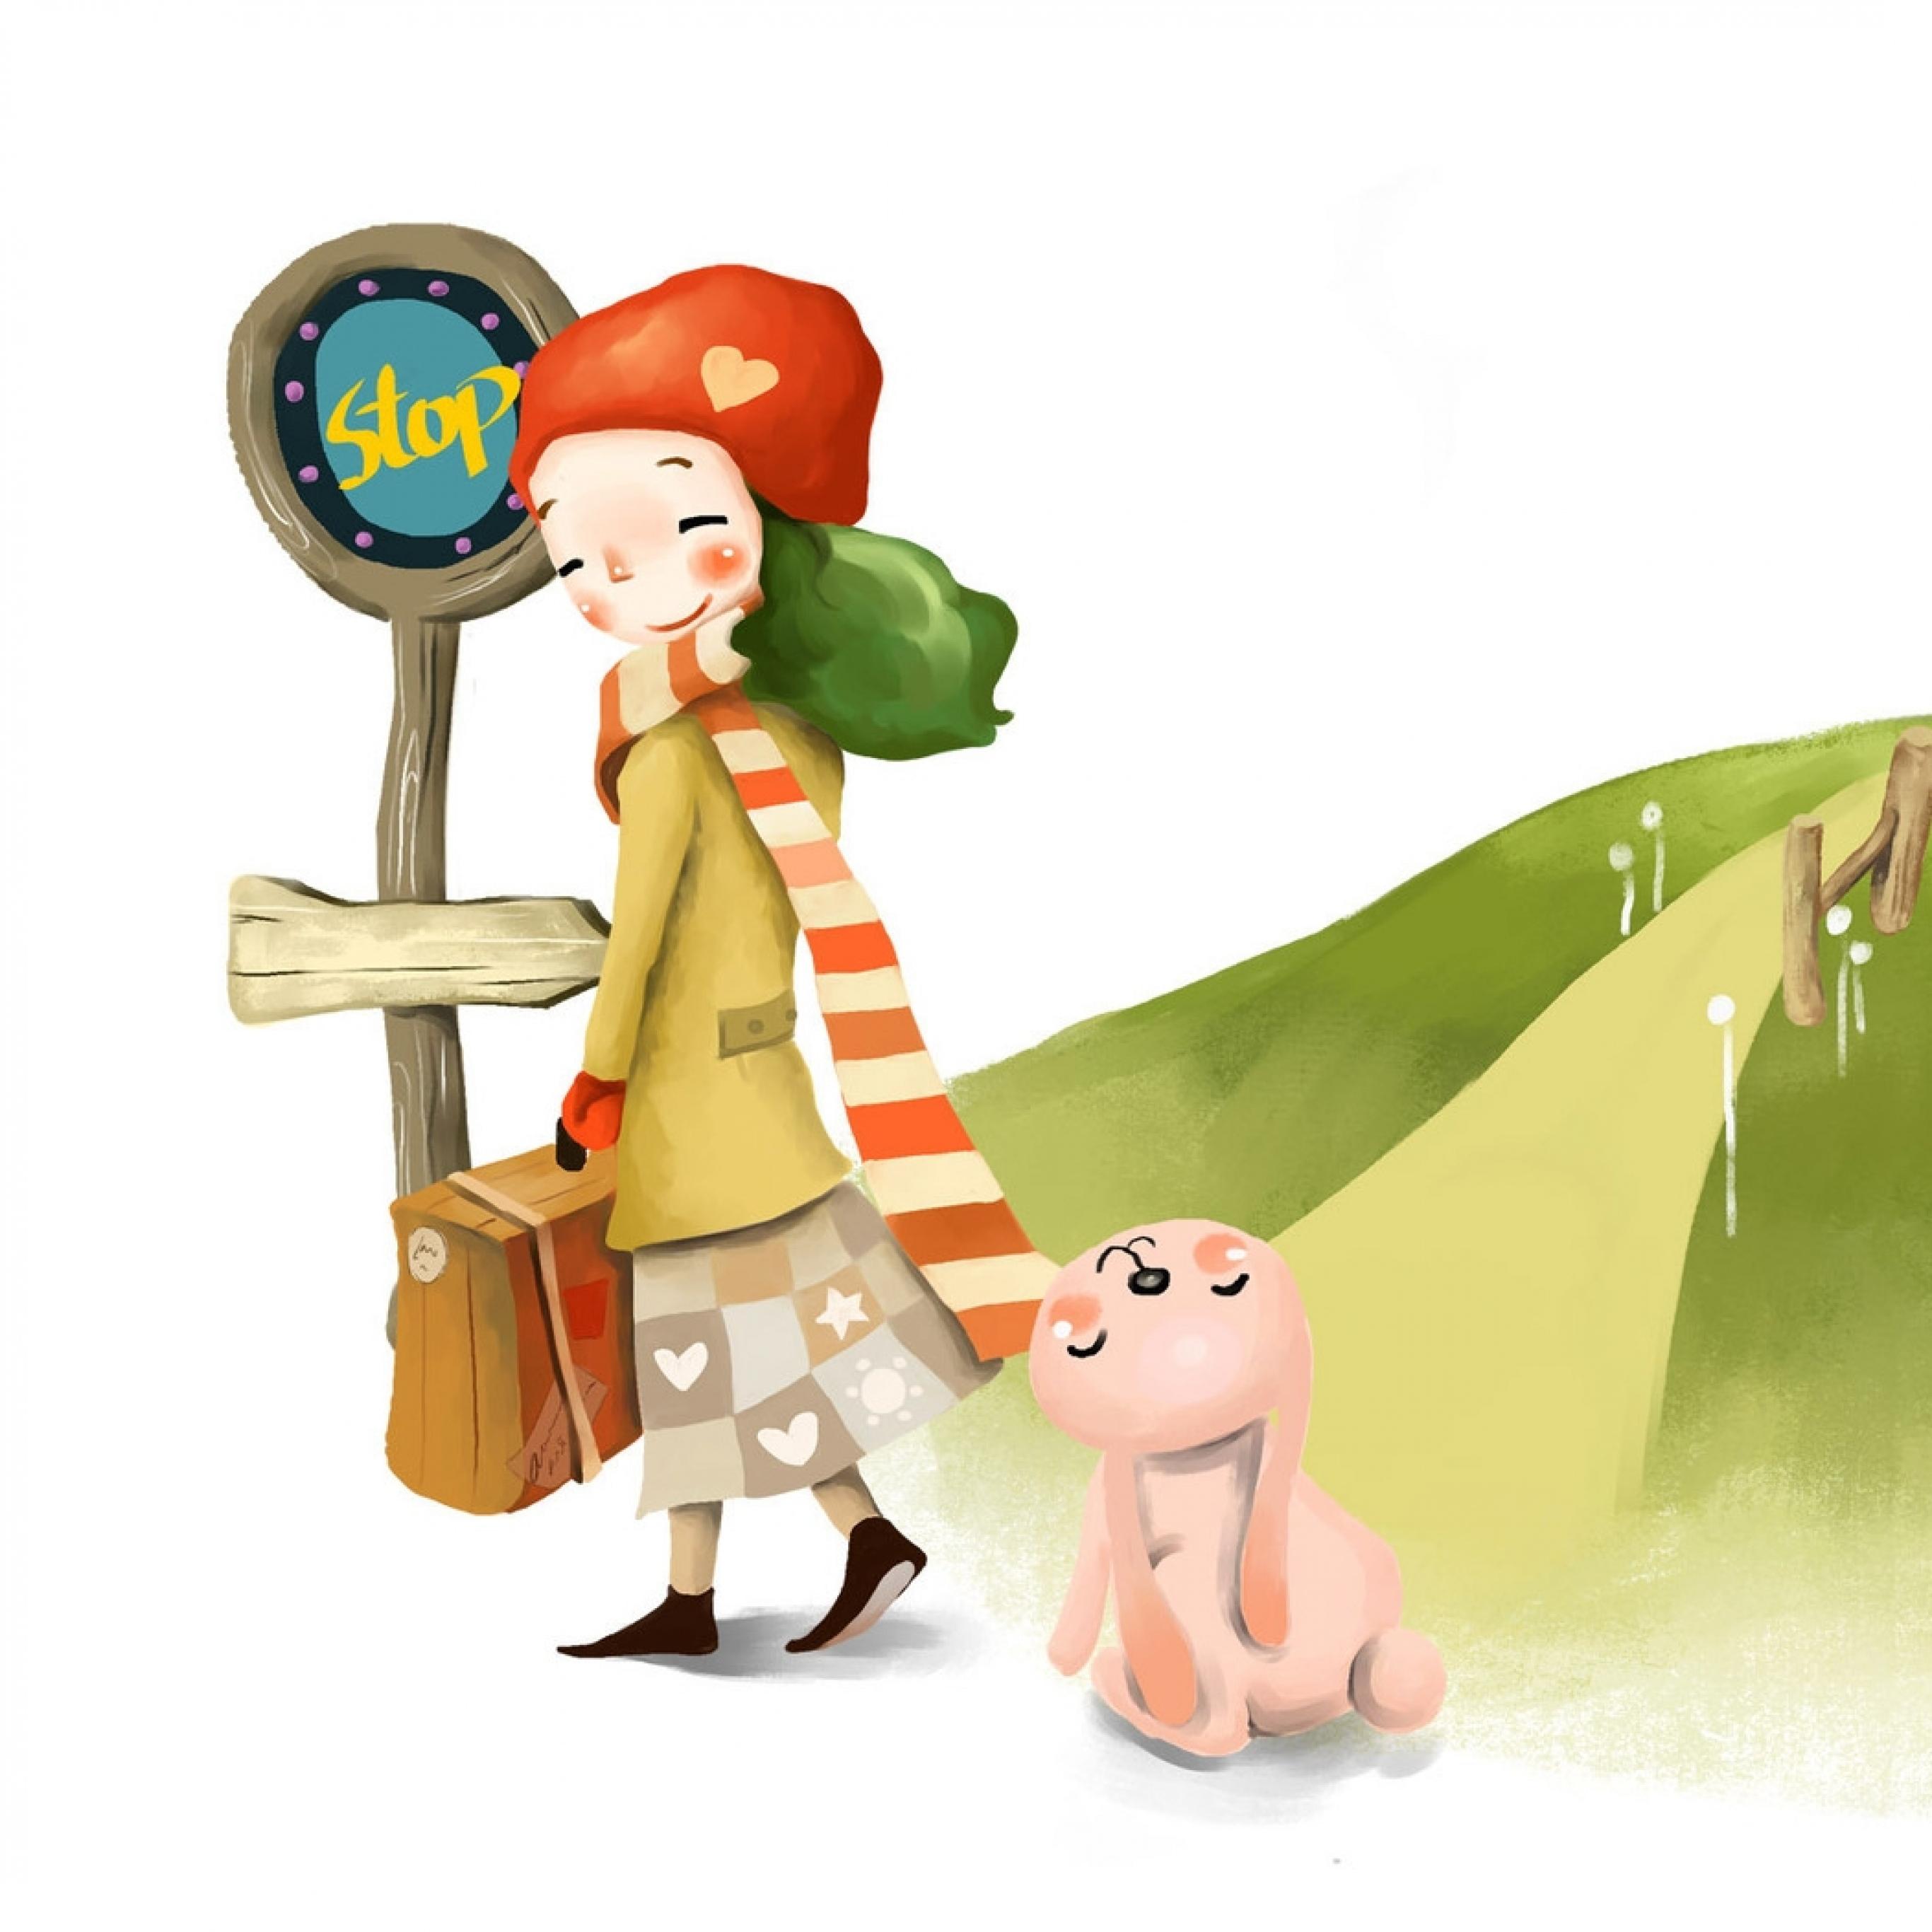 Download Wallpaper 2732x2732 Drawing, Girl, Departure, Suitcase.